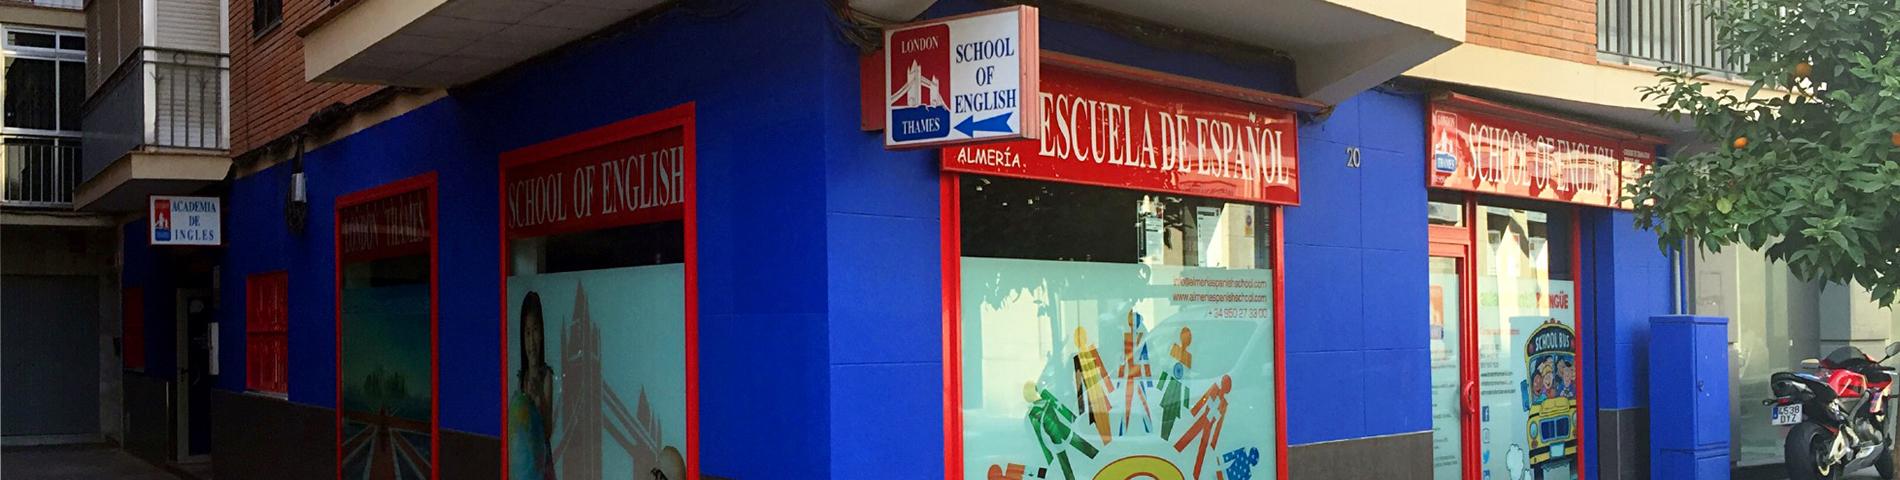 Almeria Spanish School kuva 1